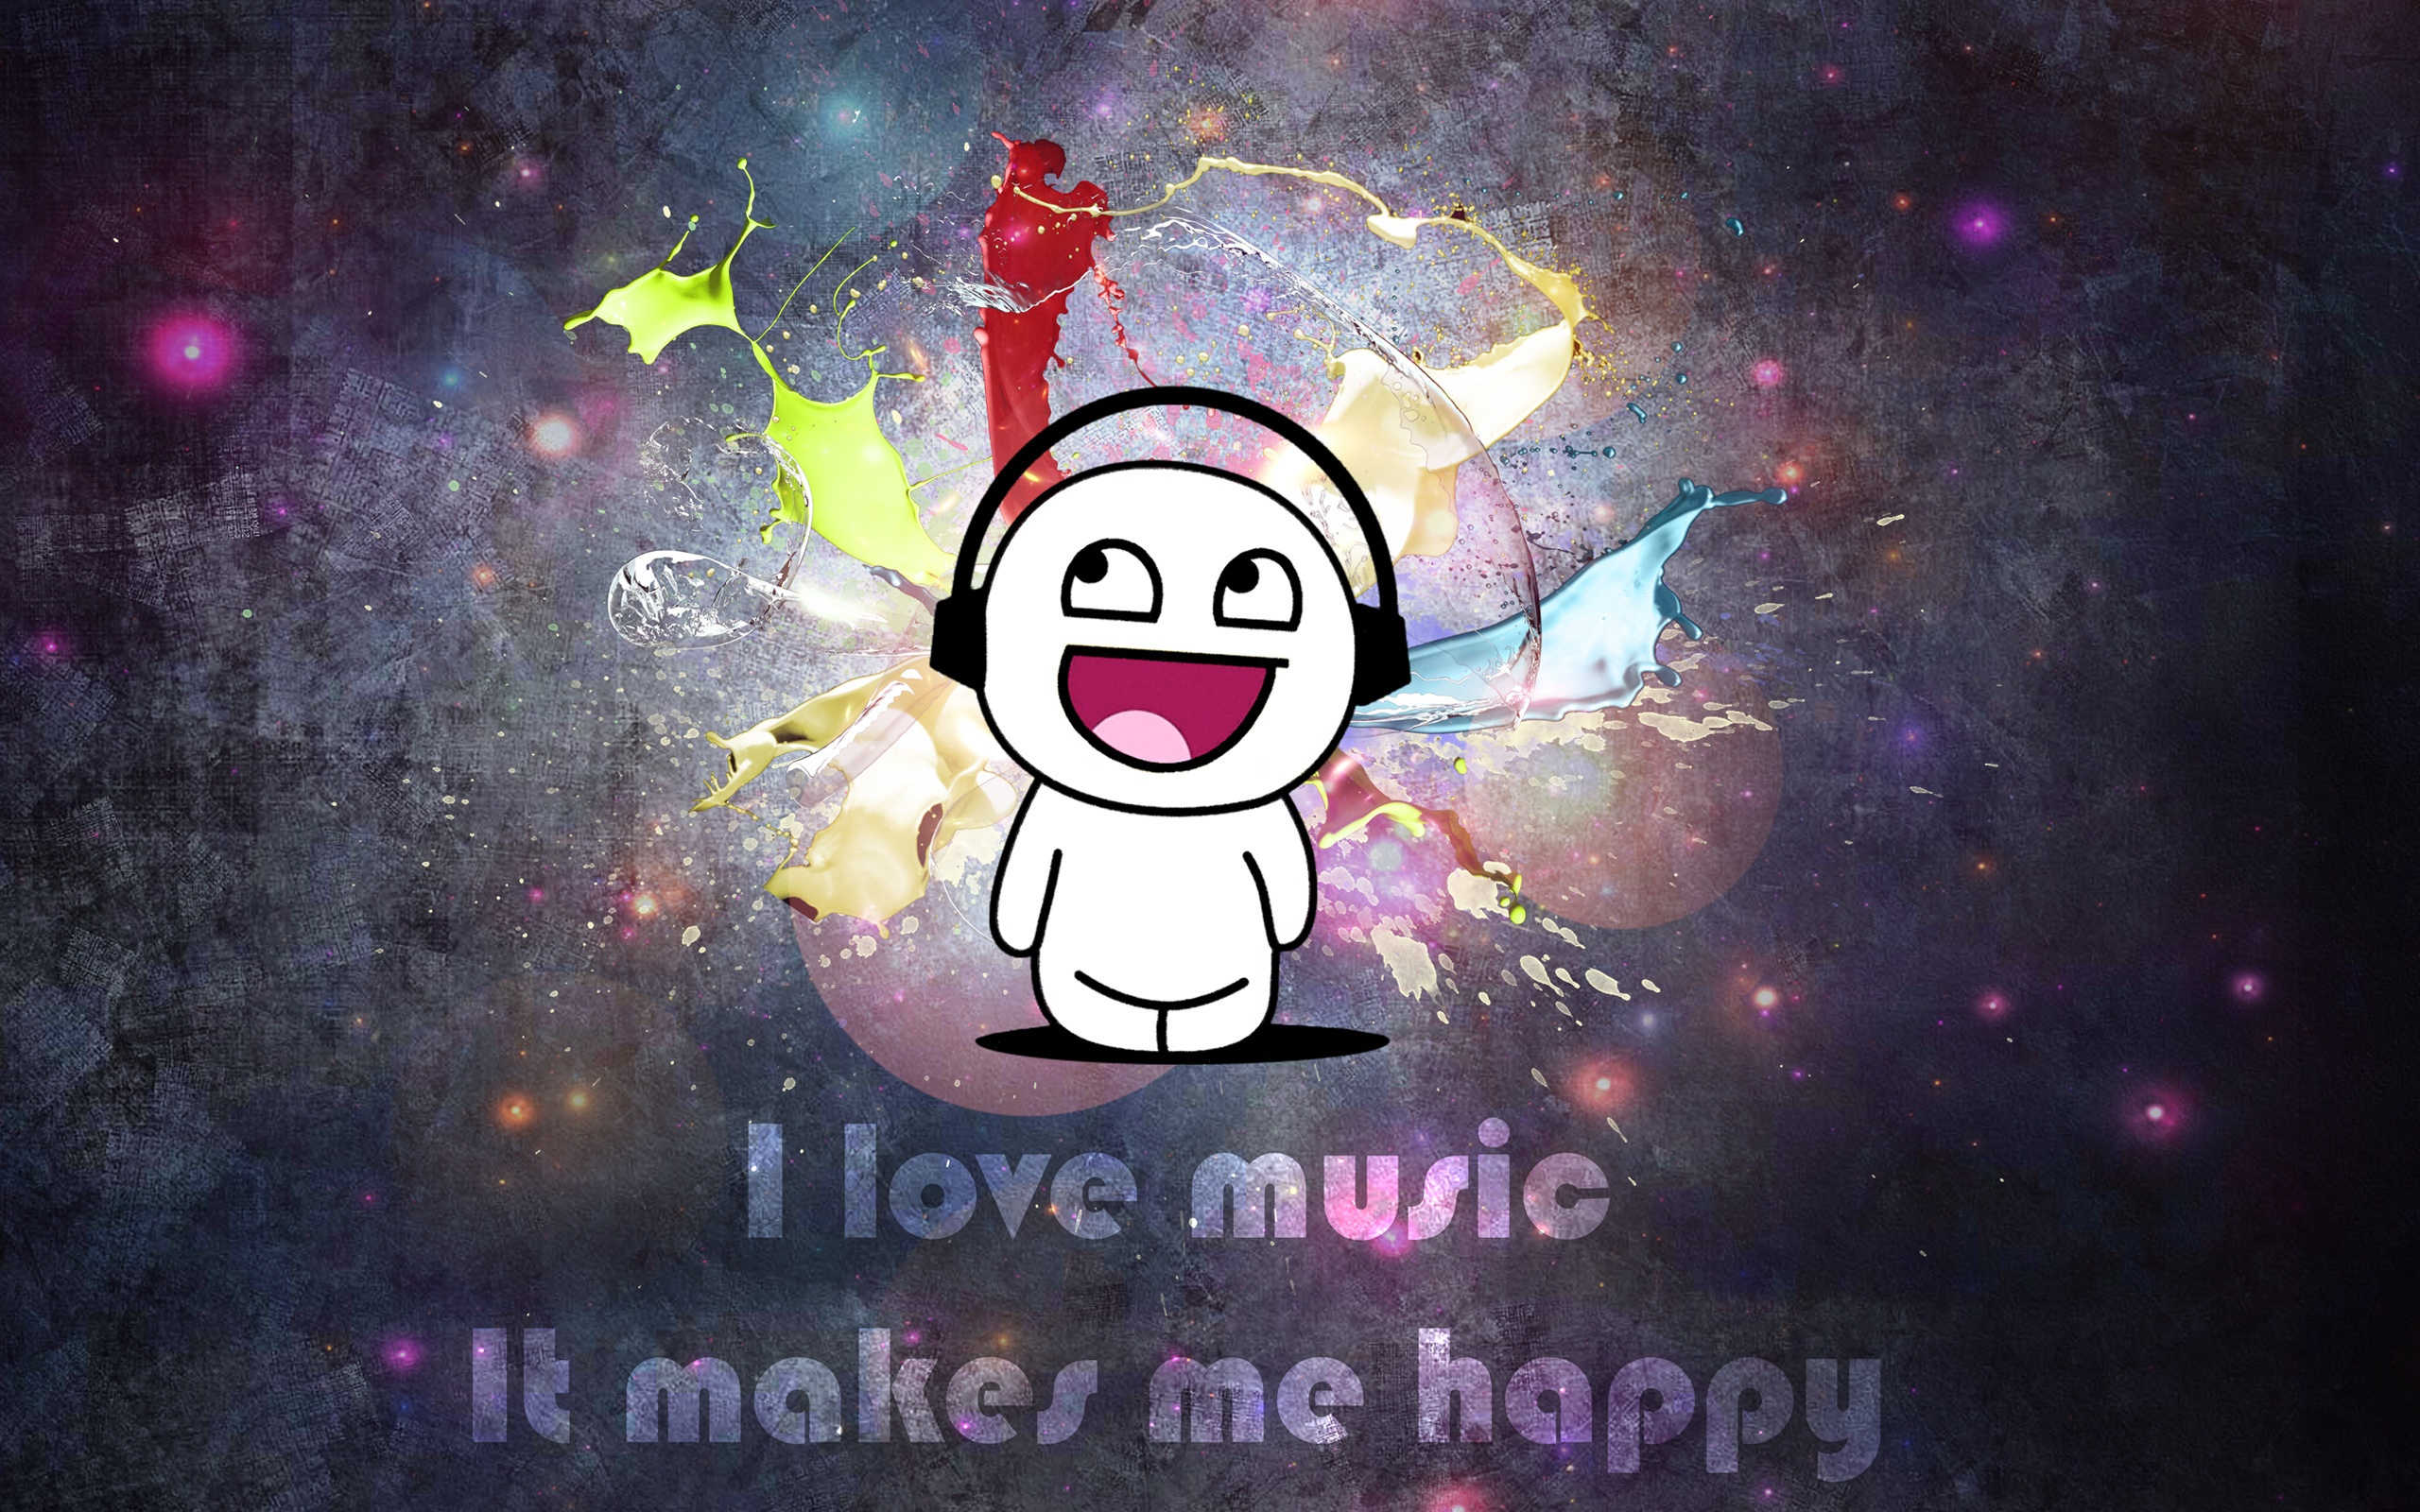 love music it makes me music anime Wallpaper Anime Wallpaper 2560x1600